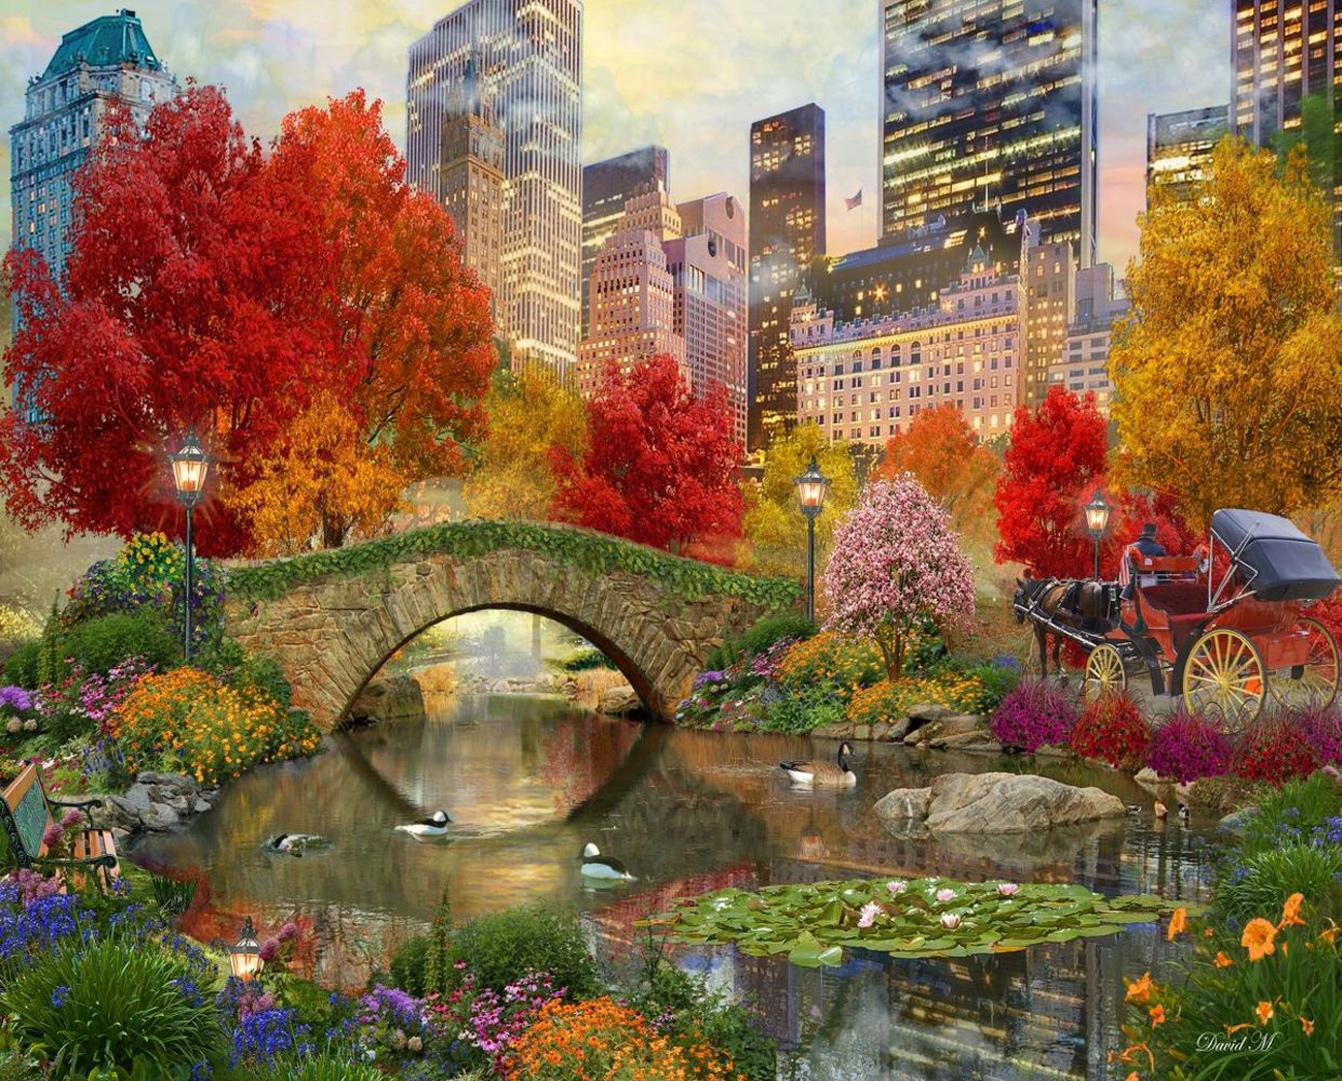 Central Park Paradise Landmarks / Monuments Jigsaw Puzzle